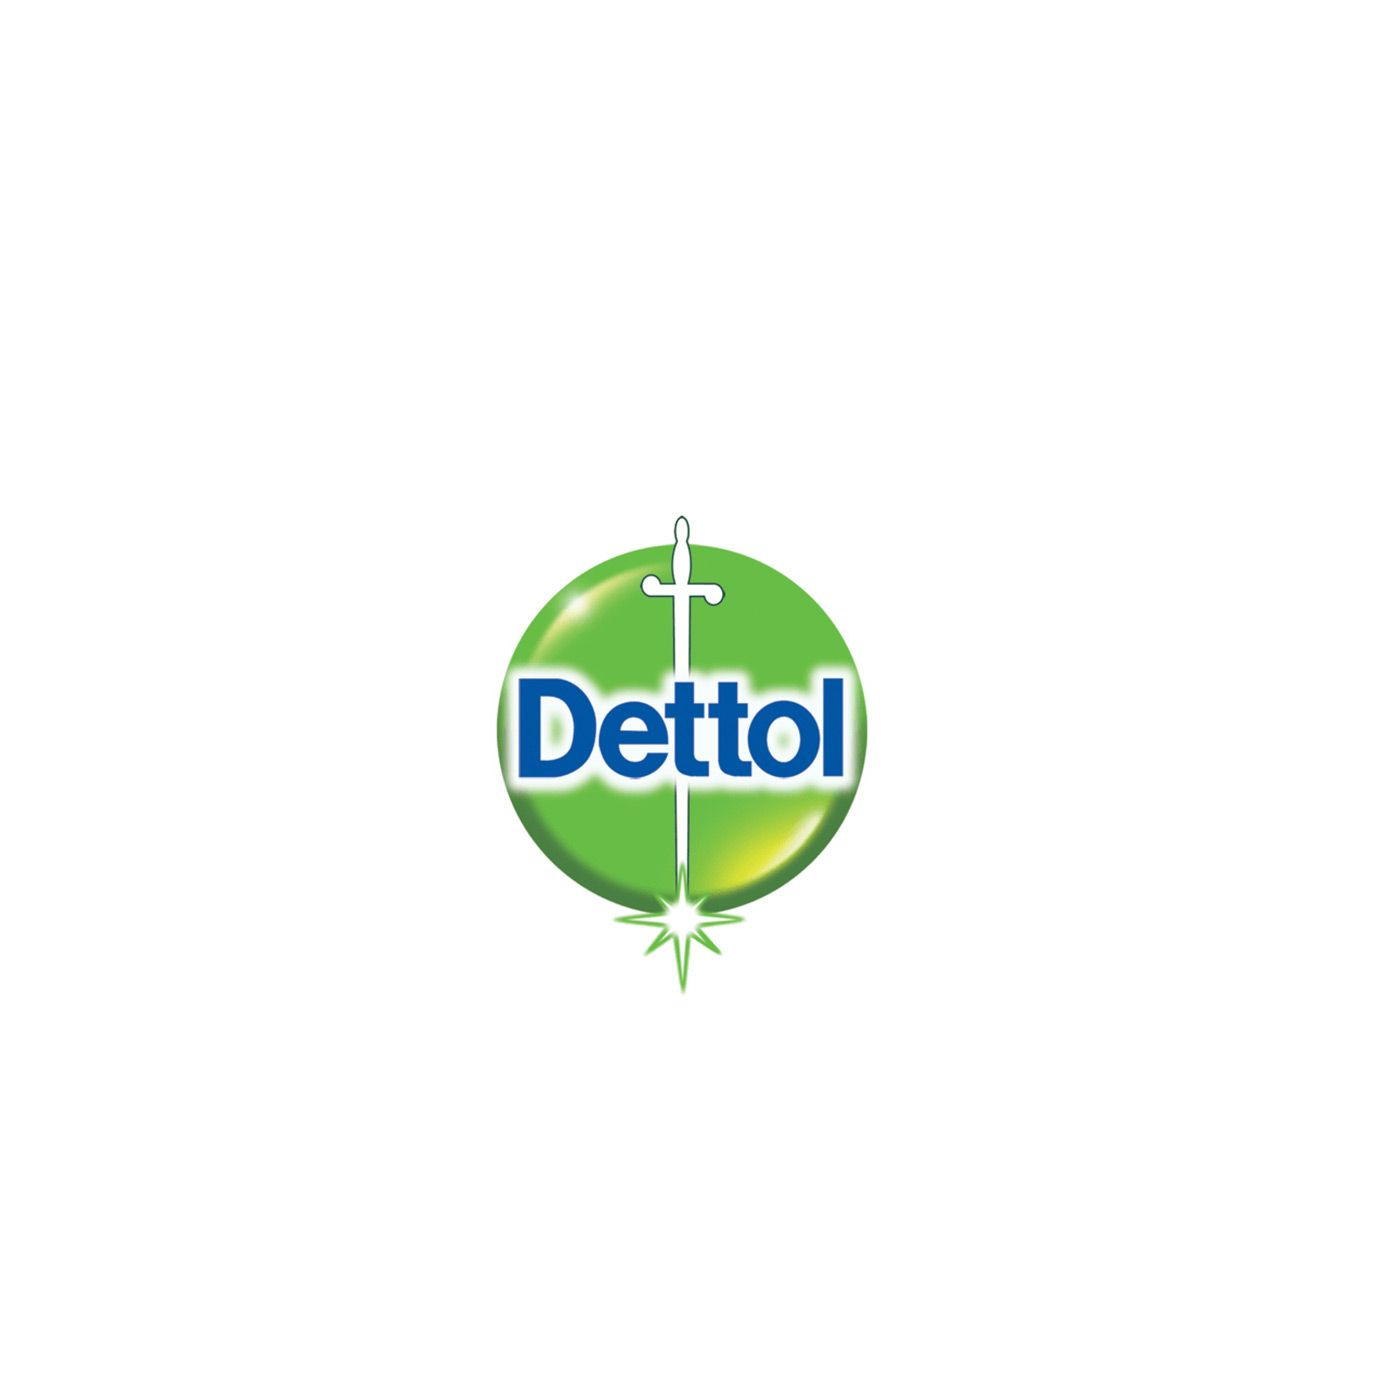 Dettol Logo.